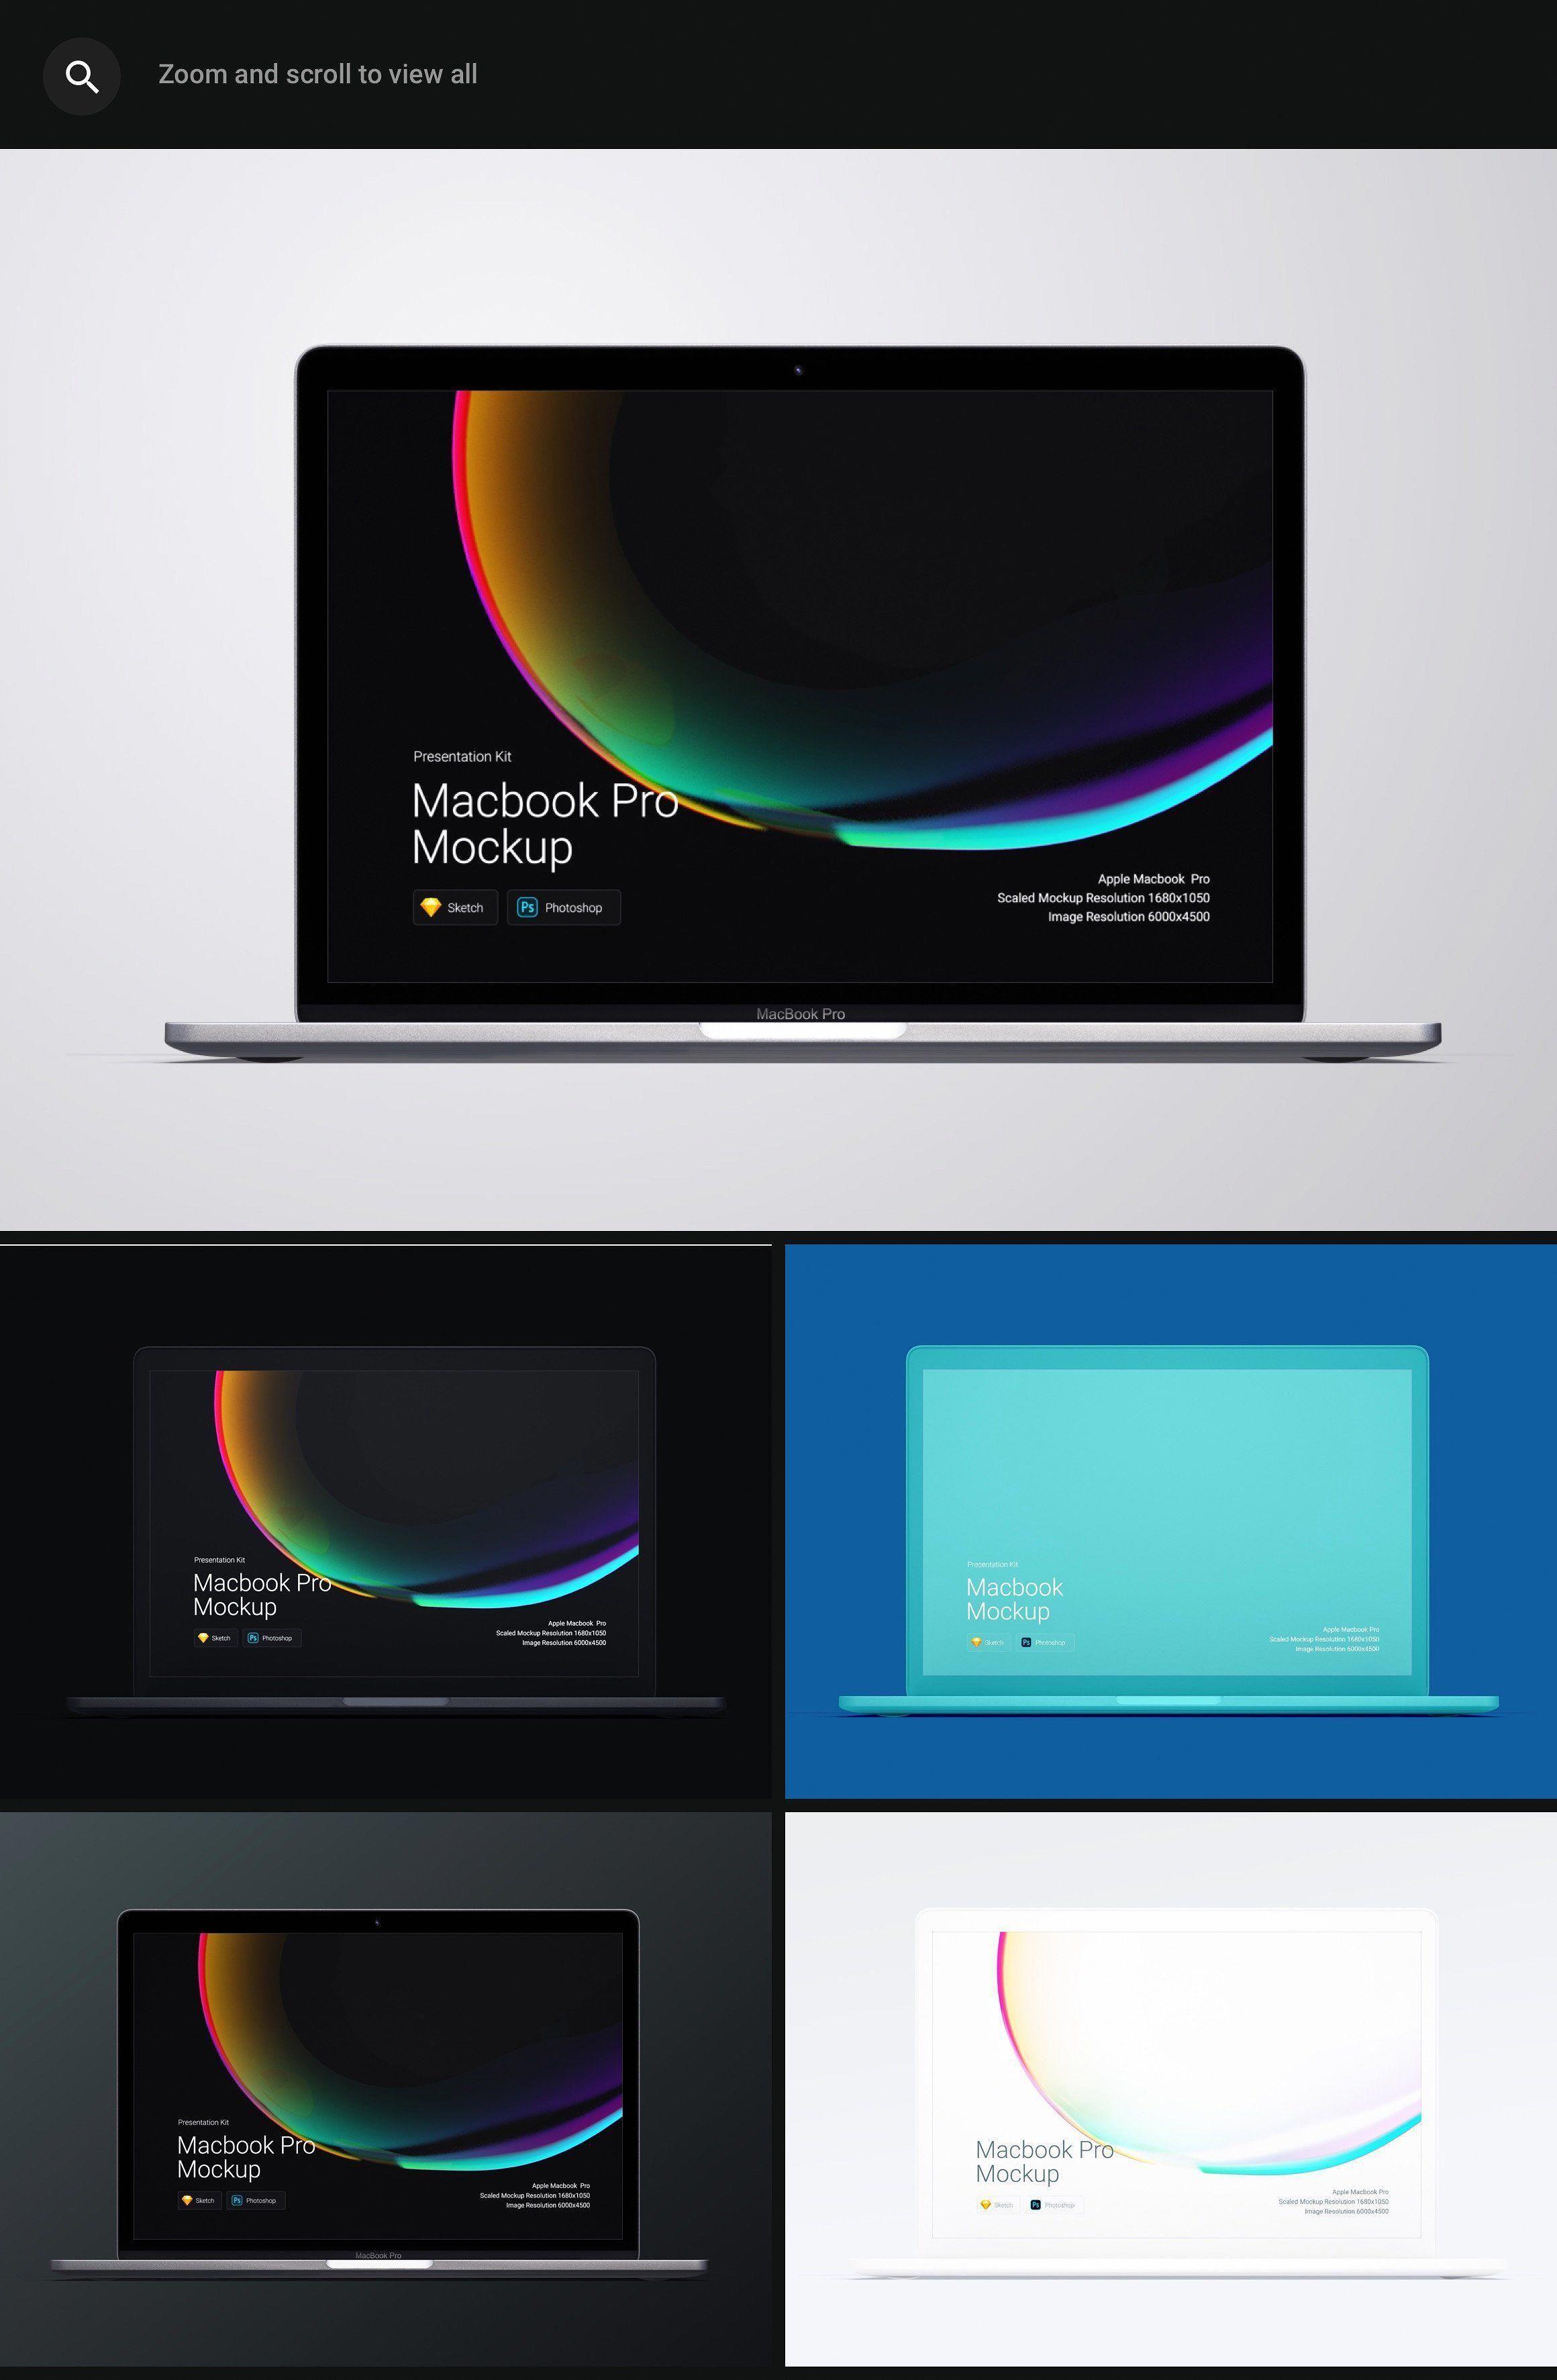 Macbook And Macbook Pro Mockups It S Time To Refresh Your Portfolio Mockup Macbook Webdesign Color Macbook Mockup Iphone Mockup Corporate Brochure Cover